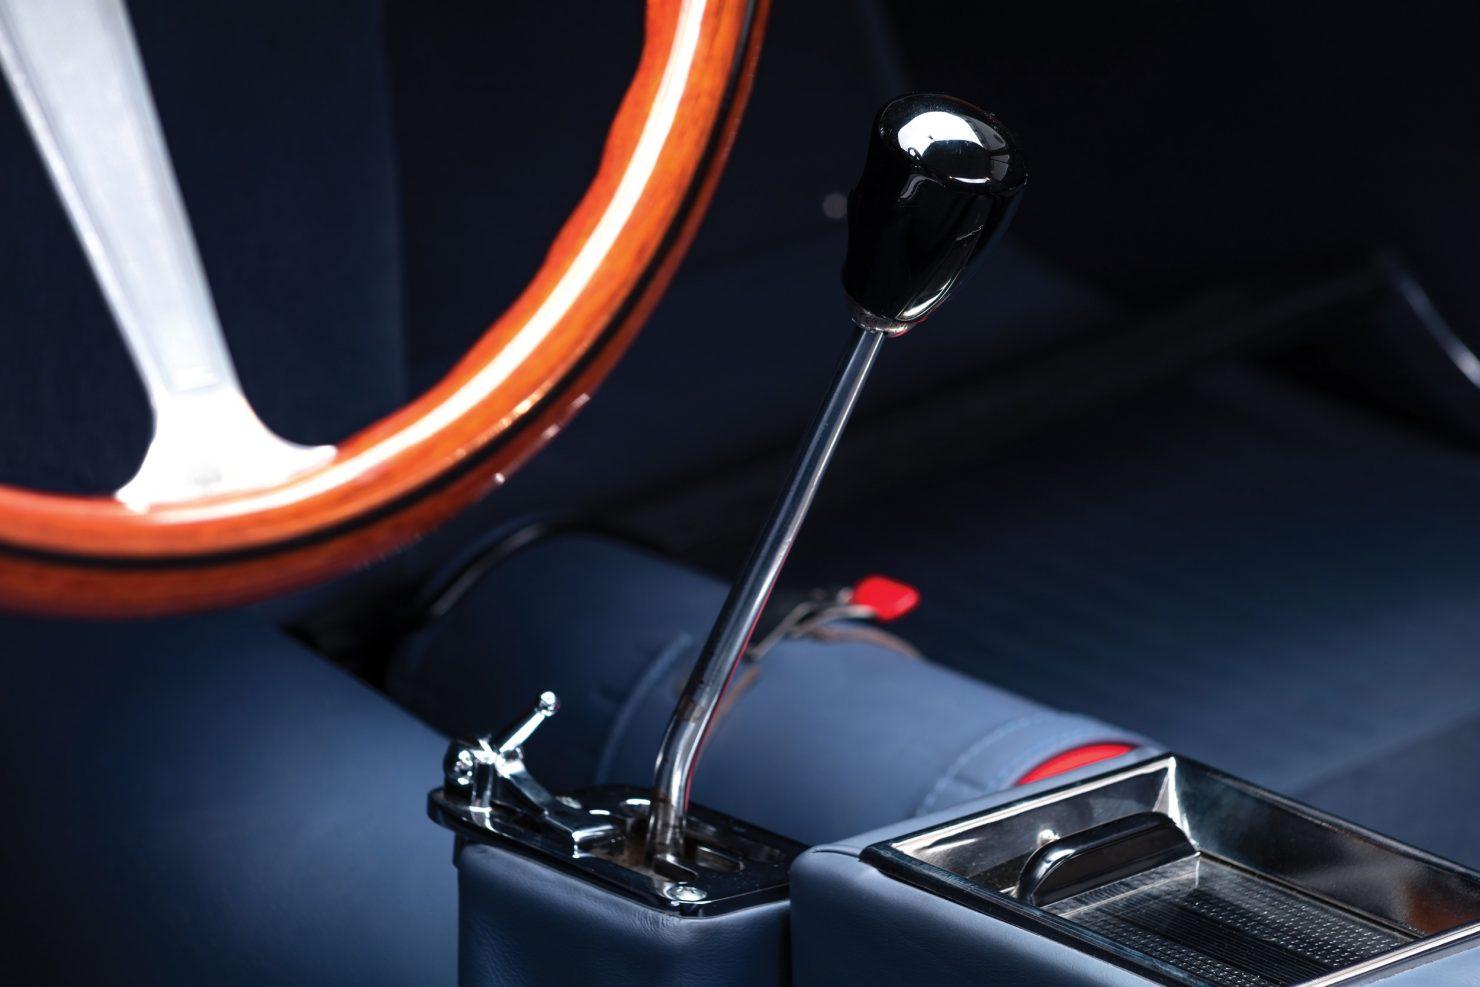 ferrari 275 gtb car 12 1480x987 - 1965 Ferrari 275 GTB/6C Alloy